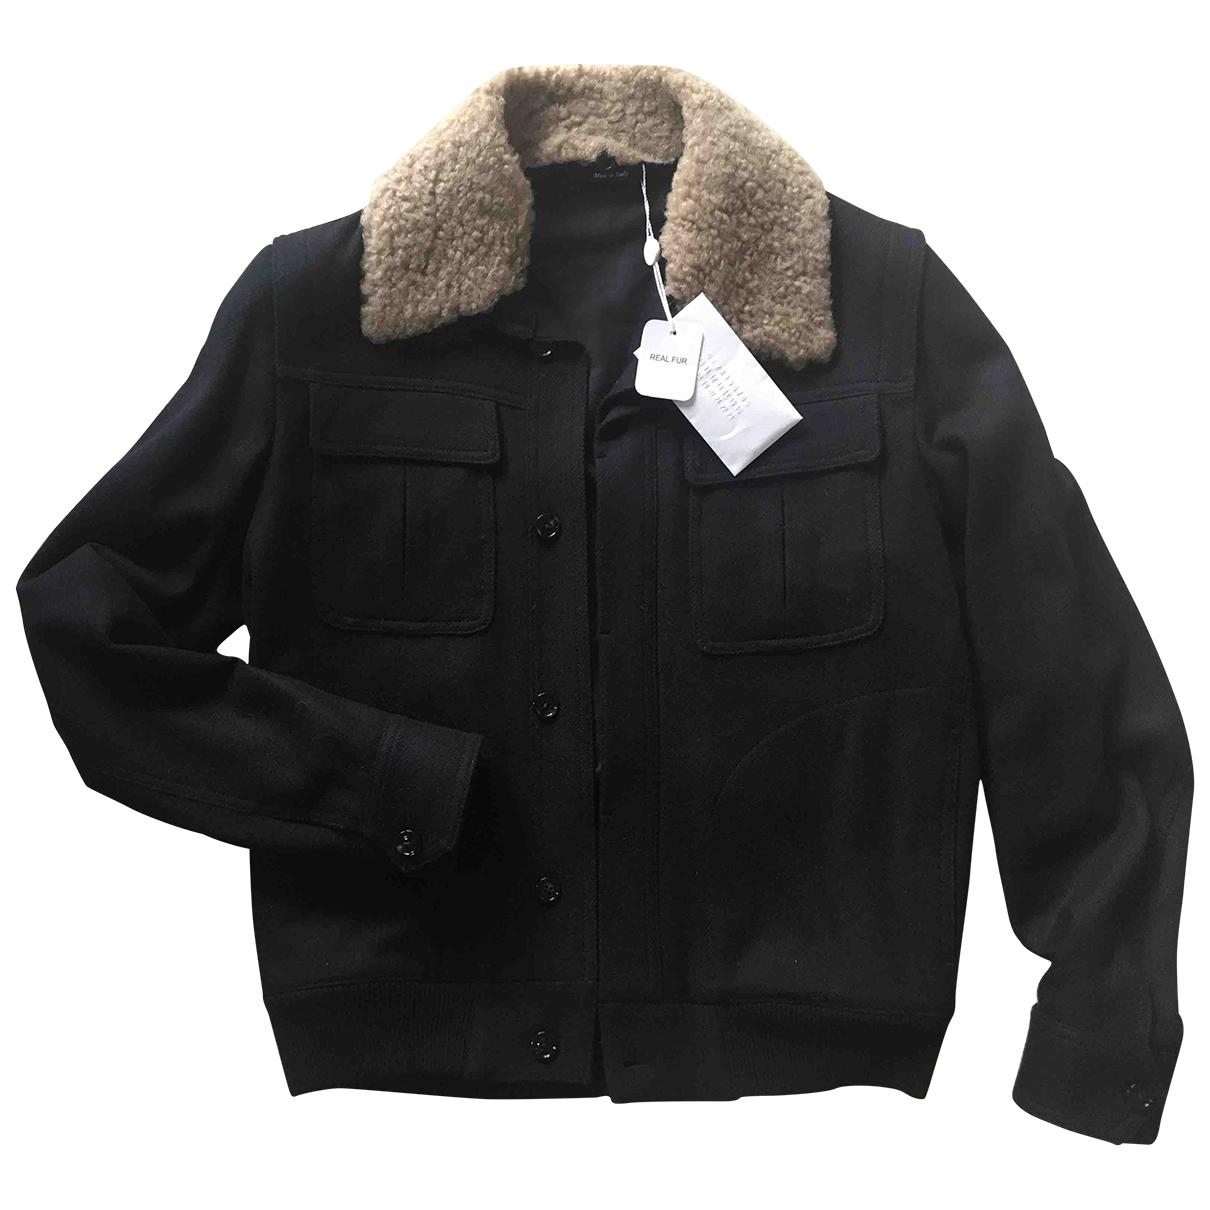 Maison Martin Margiela \N Black Cashmere jacket  for Men 46 IT